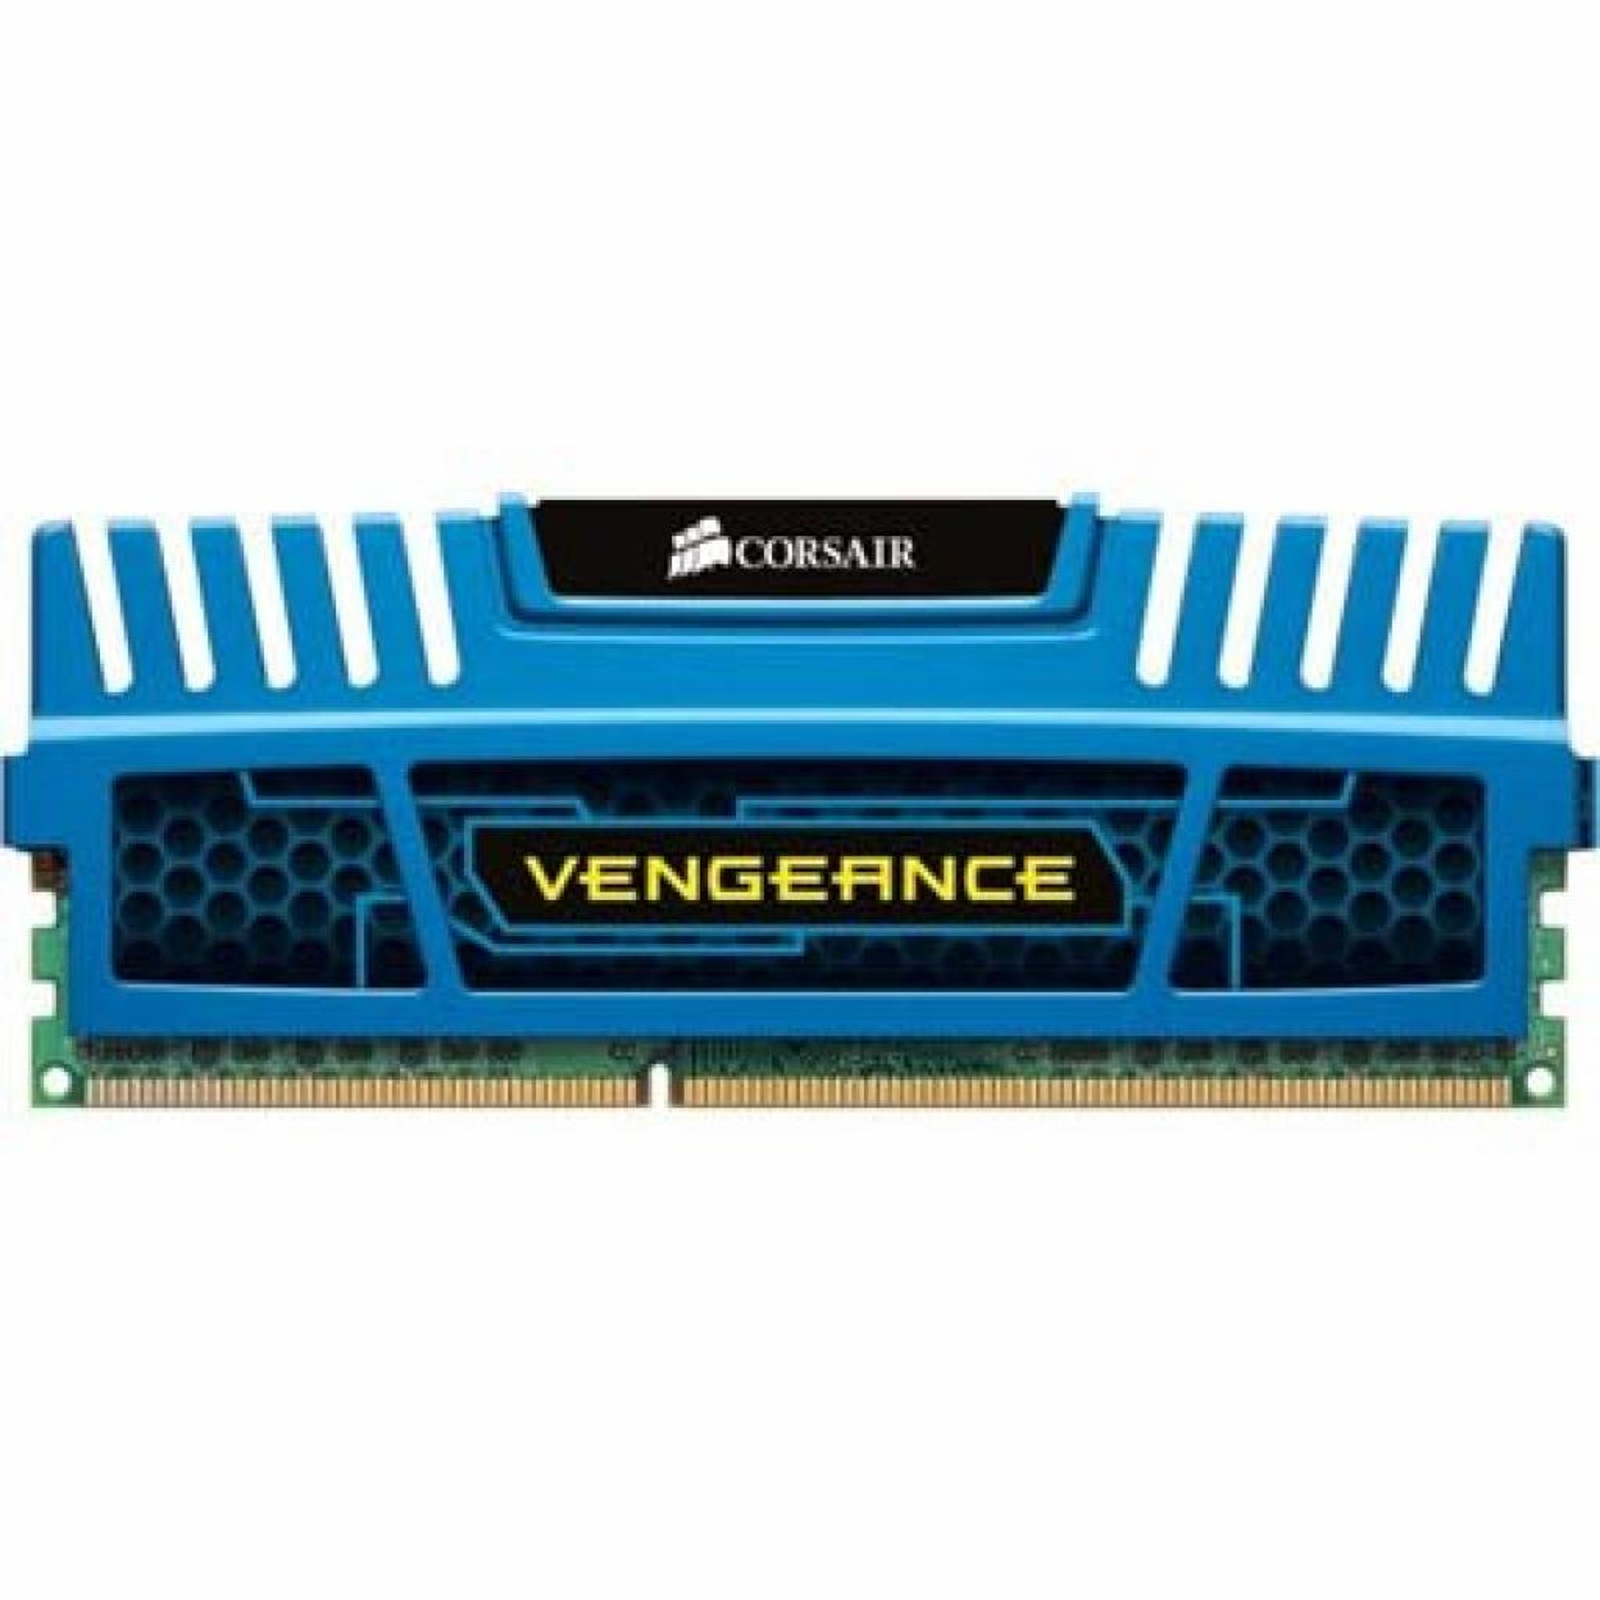 Модуль памяти для компьютера DDR3 4GB 1600 MHz CORSAIR (CMZ4GX3M1A1600C9B)